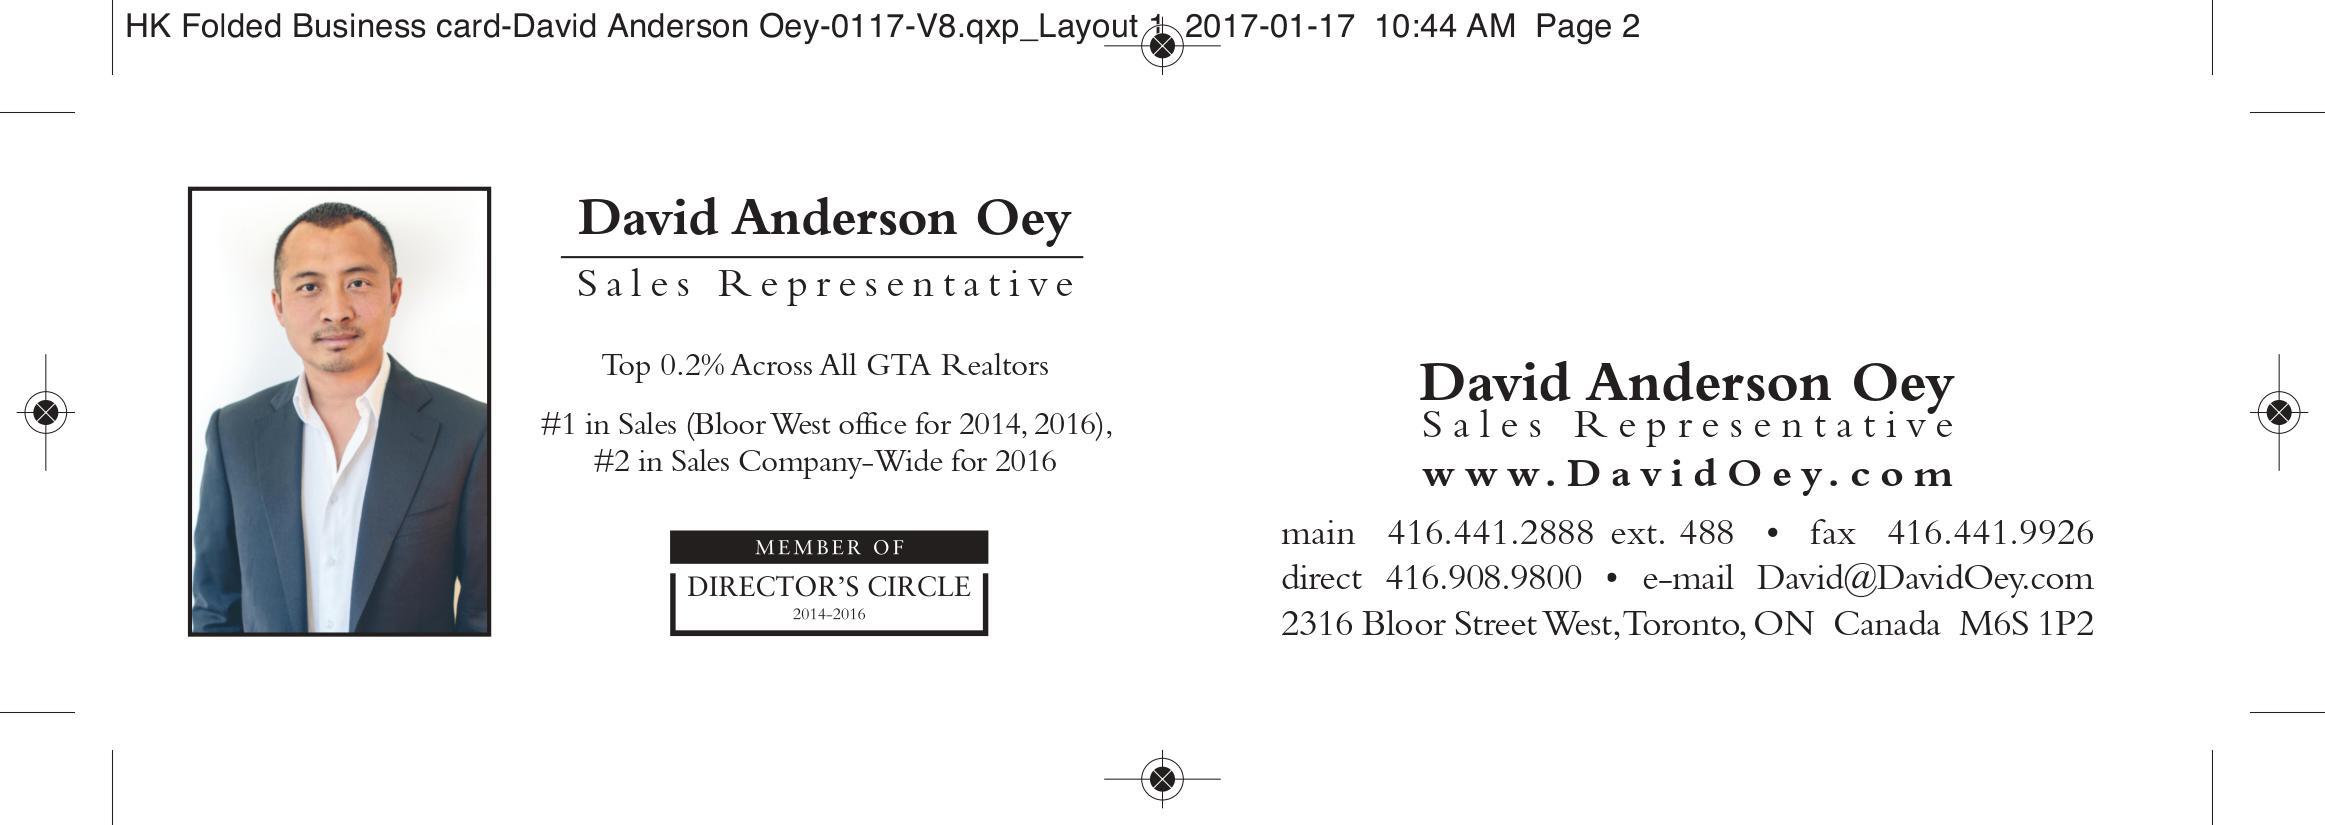 Harvey Kalles Business Card Layout | JR Shooter